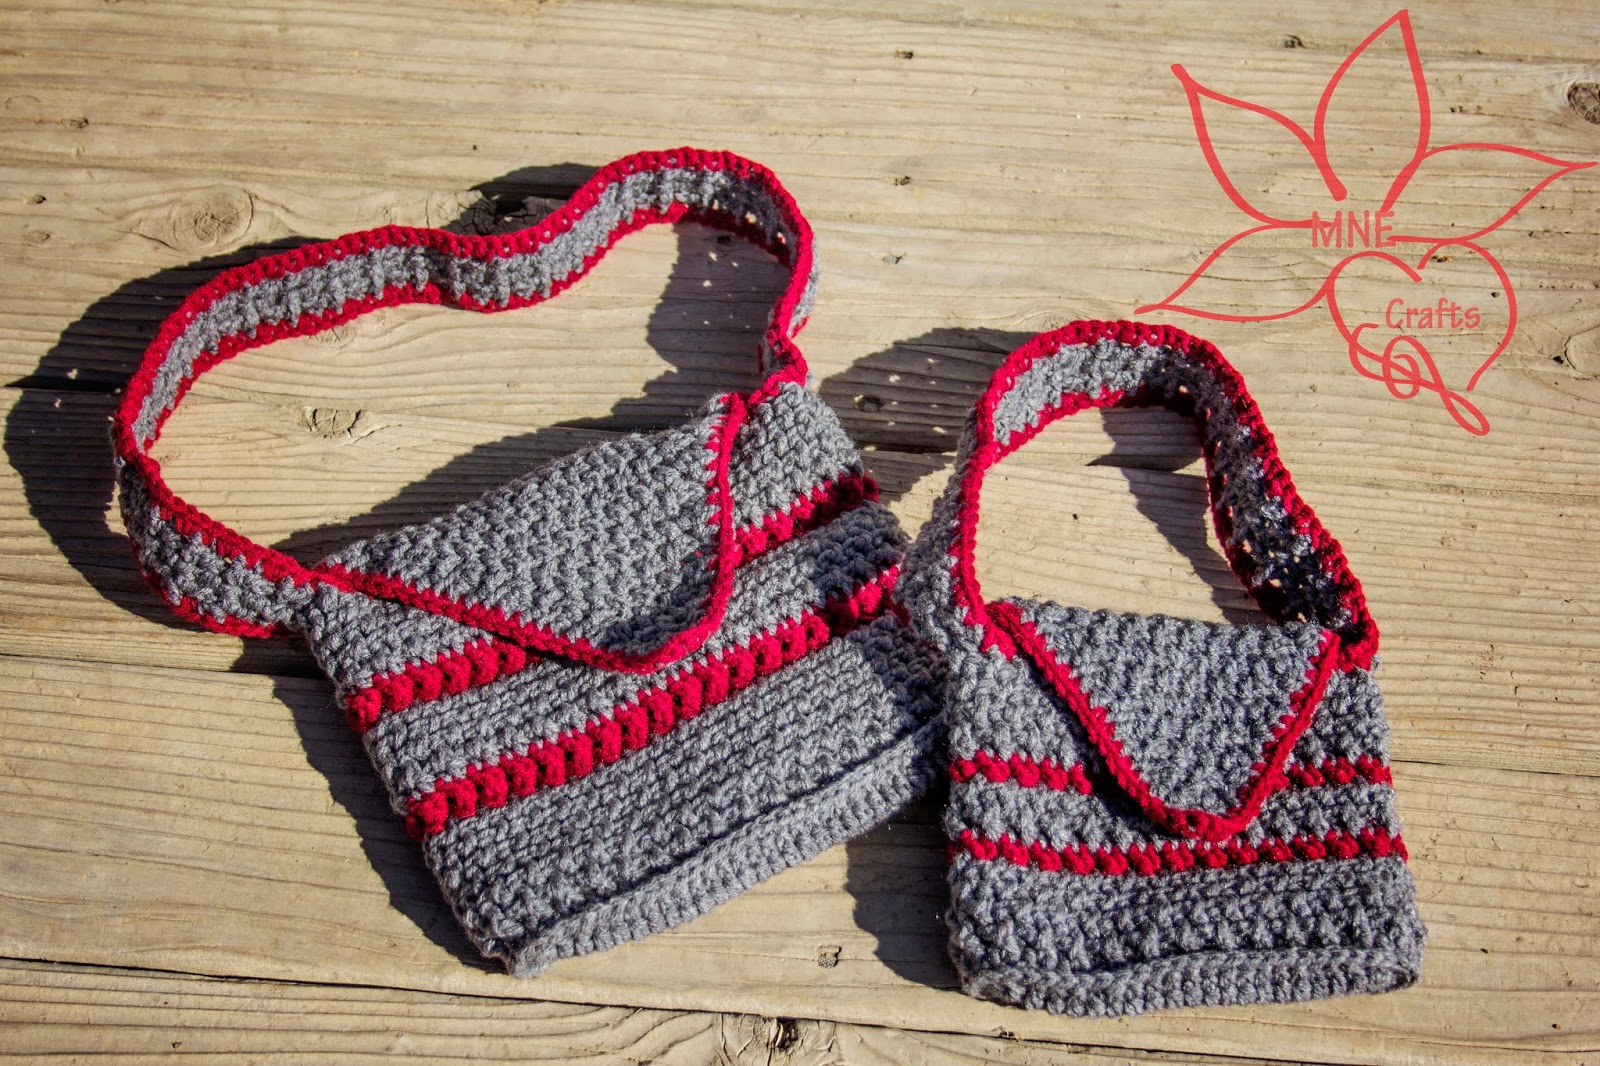 Fiber flux pretty purses 20 free crochet purse patterns fiber flux pretty purses 20 free crochet purse patterns ccuart Image collections